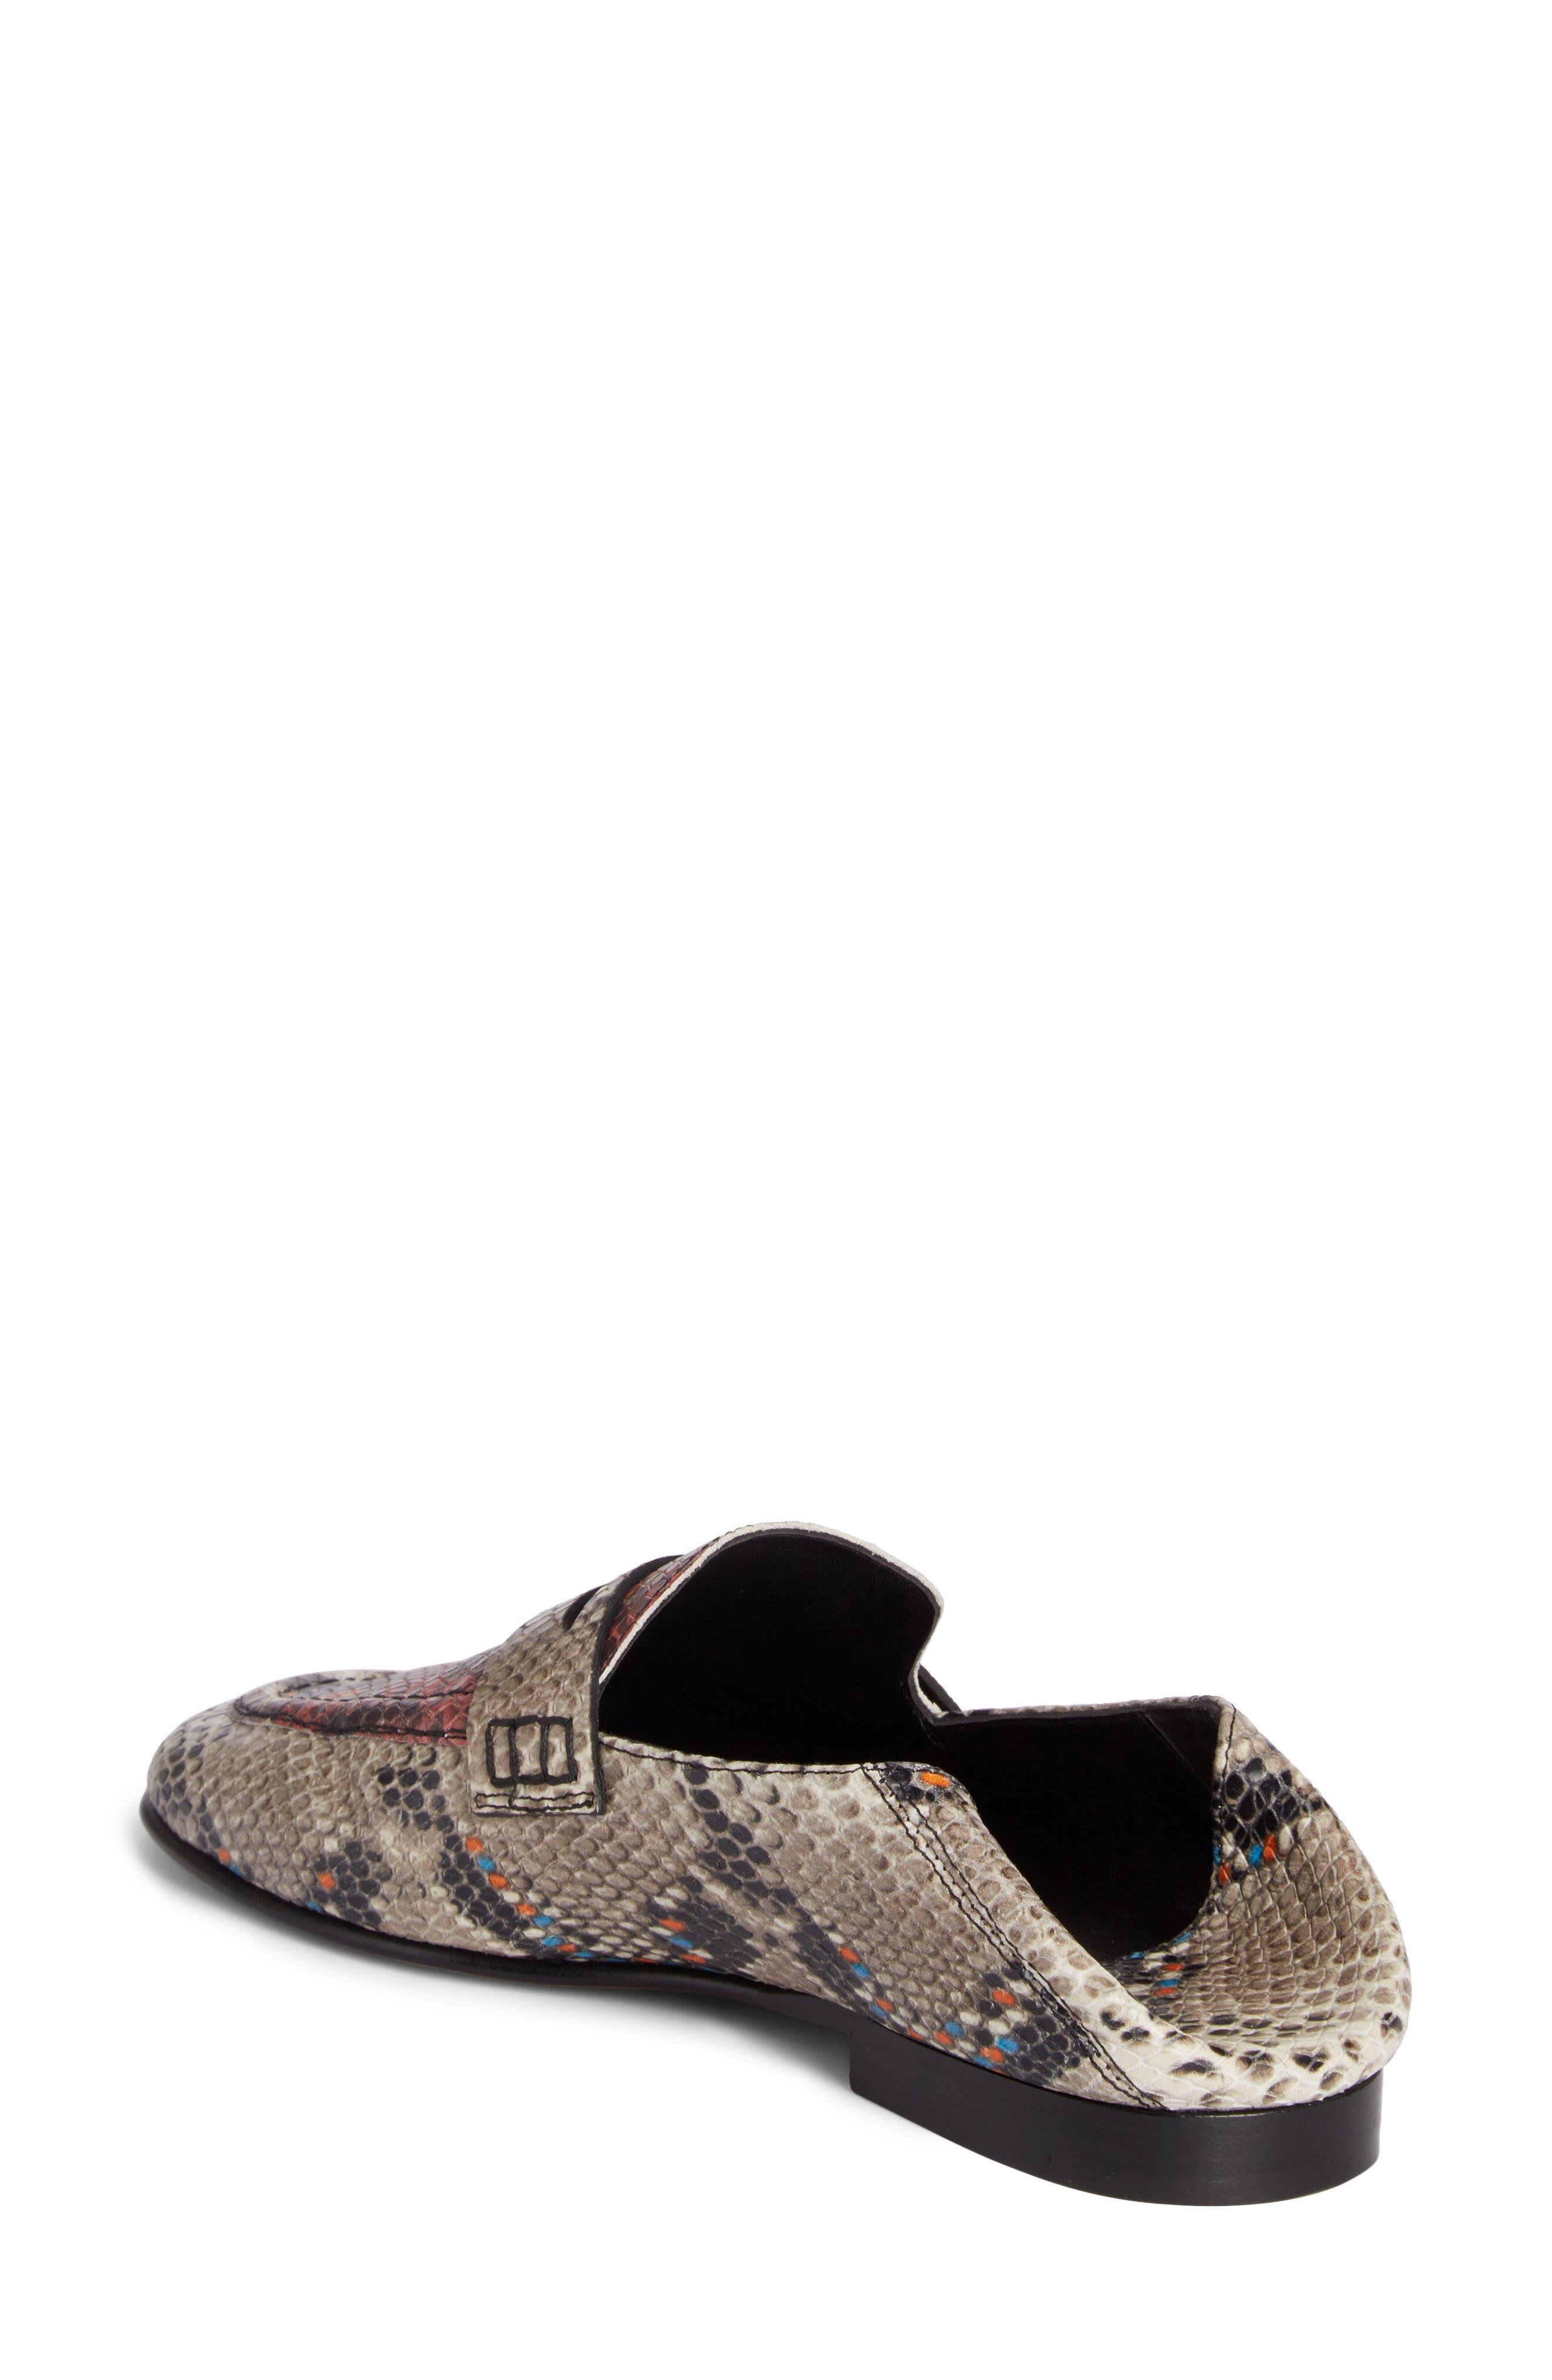 Fezzy Snakeskin Embossed Convertible Loafer,                             Alternate thumbnail 2, color,